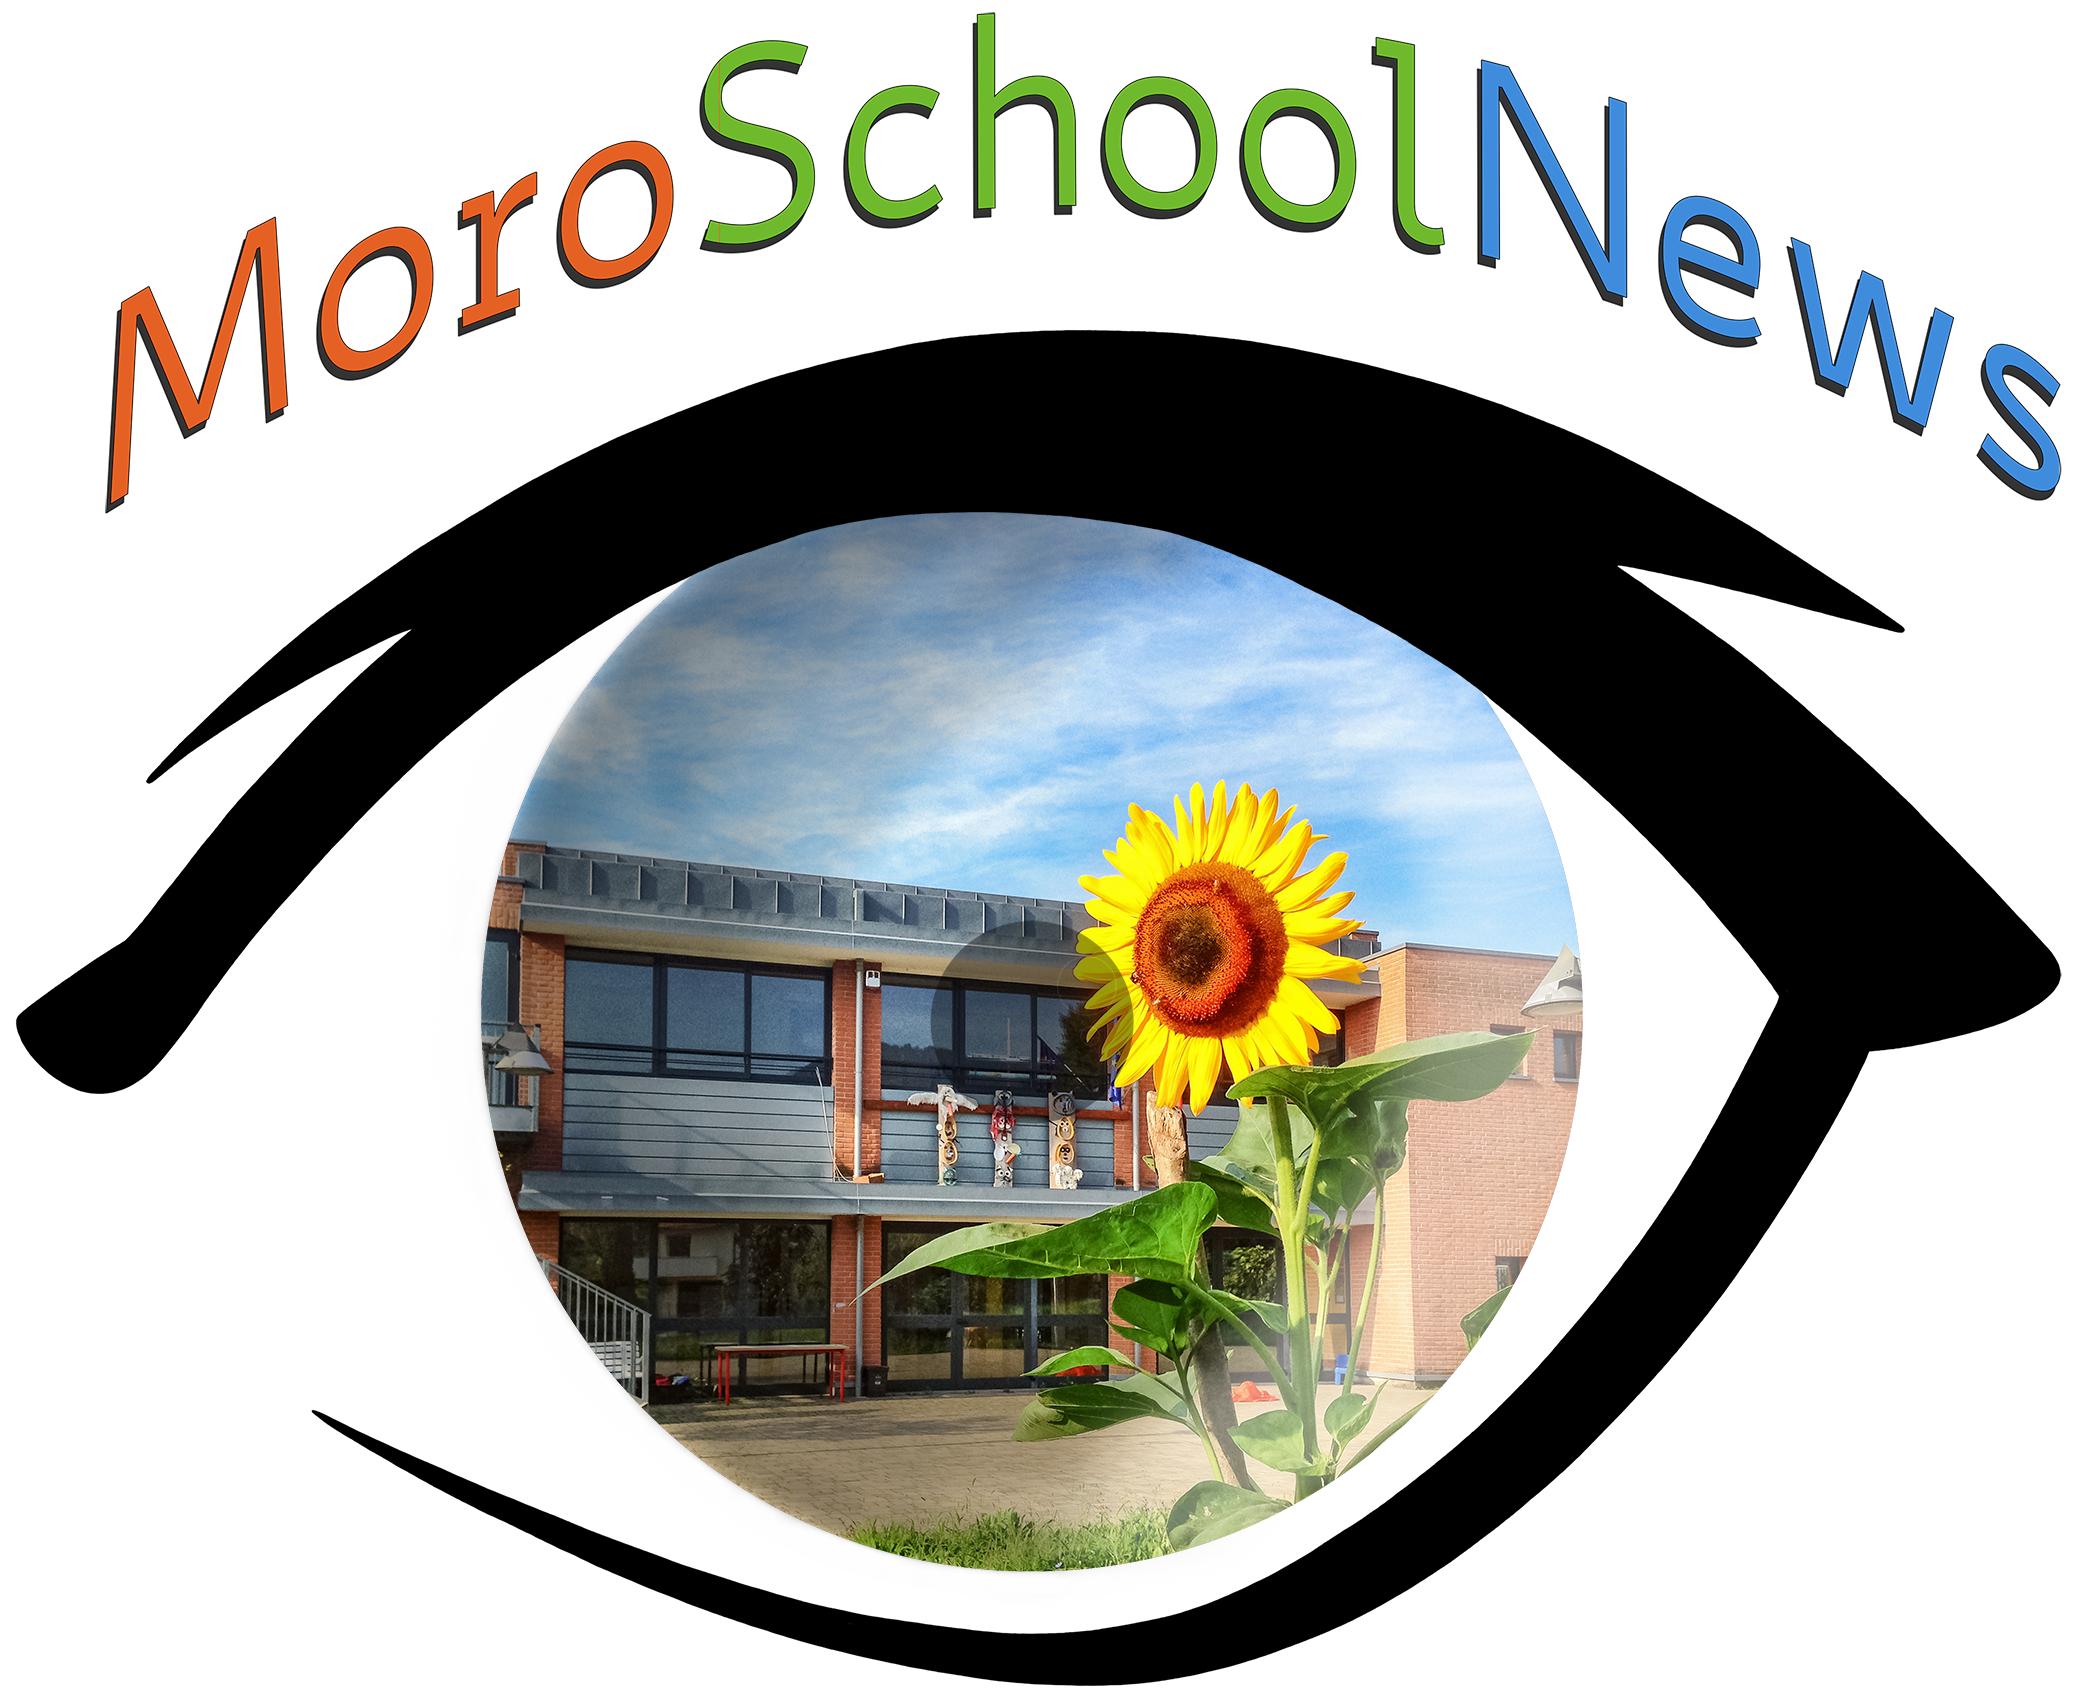 Moroschoolnews